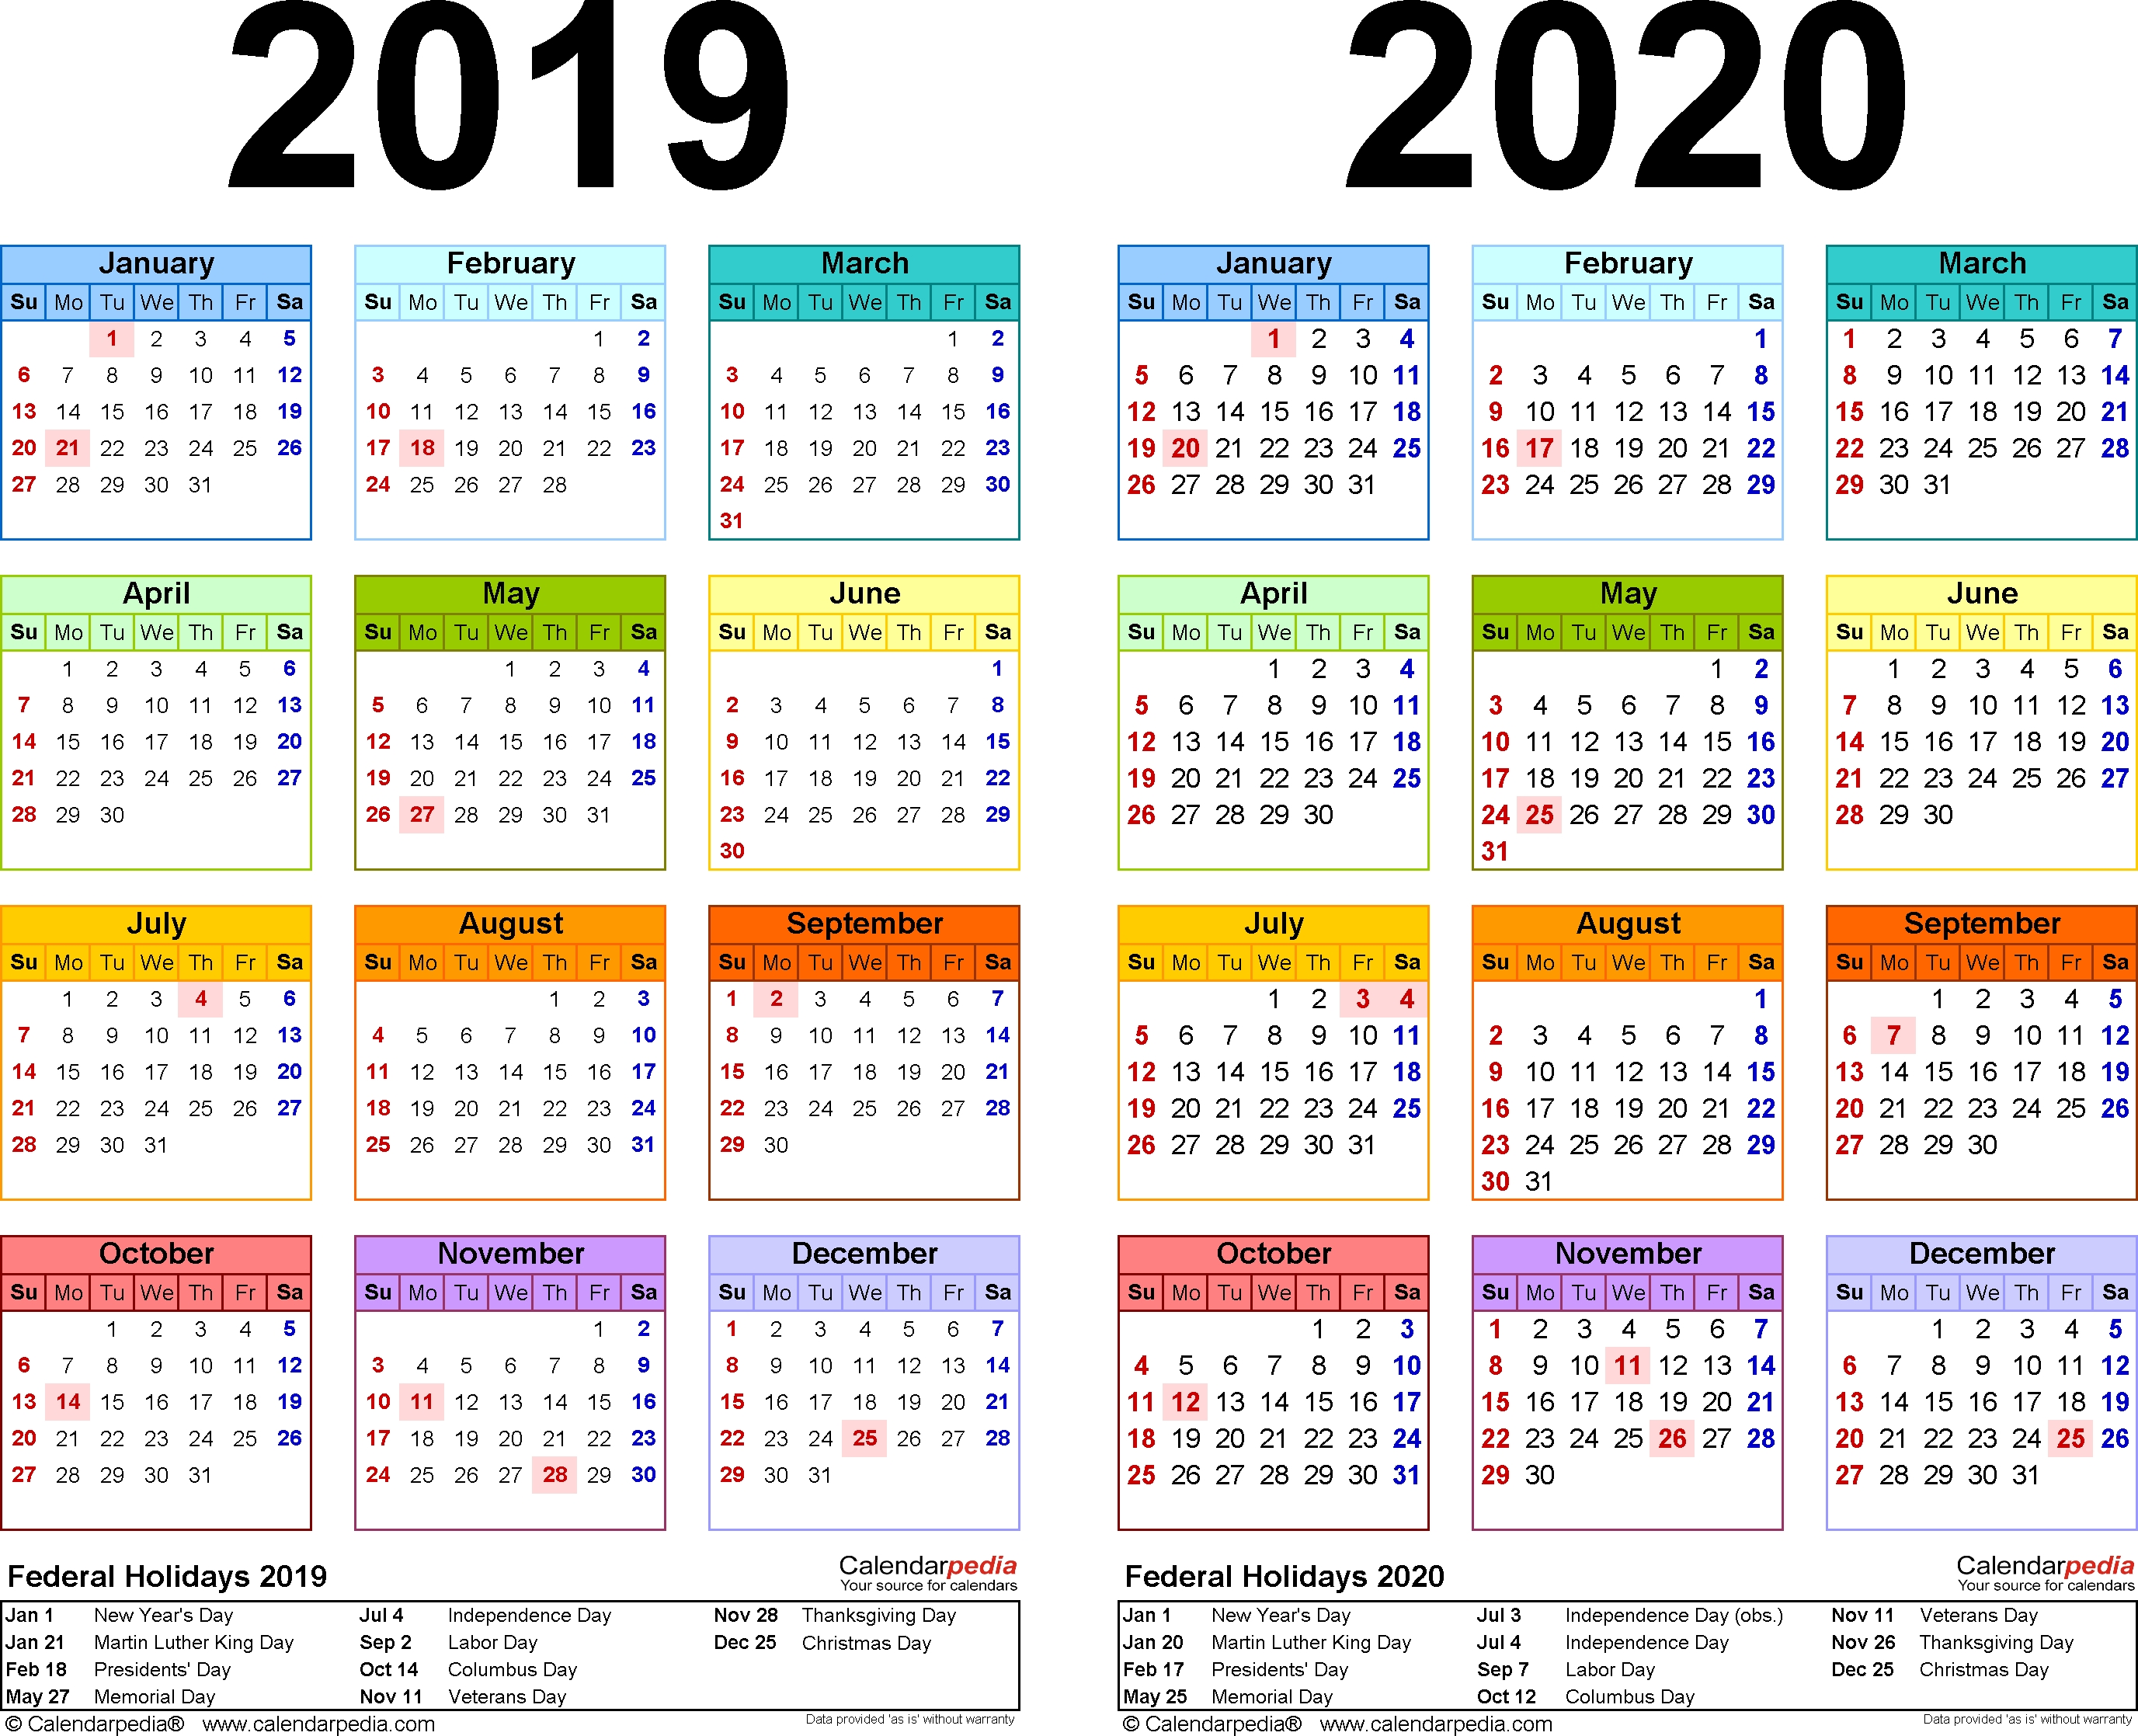 2019 2020 School Year Calendar With Holiday Us - Google-2020 Calendar With Holidays Usa Printable Year In Advance